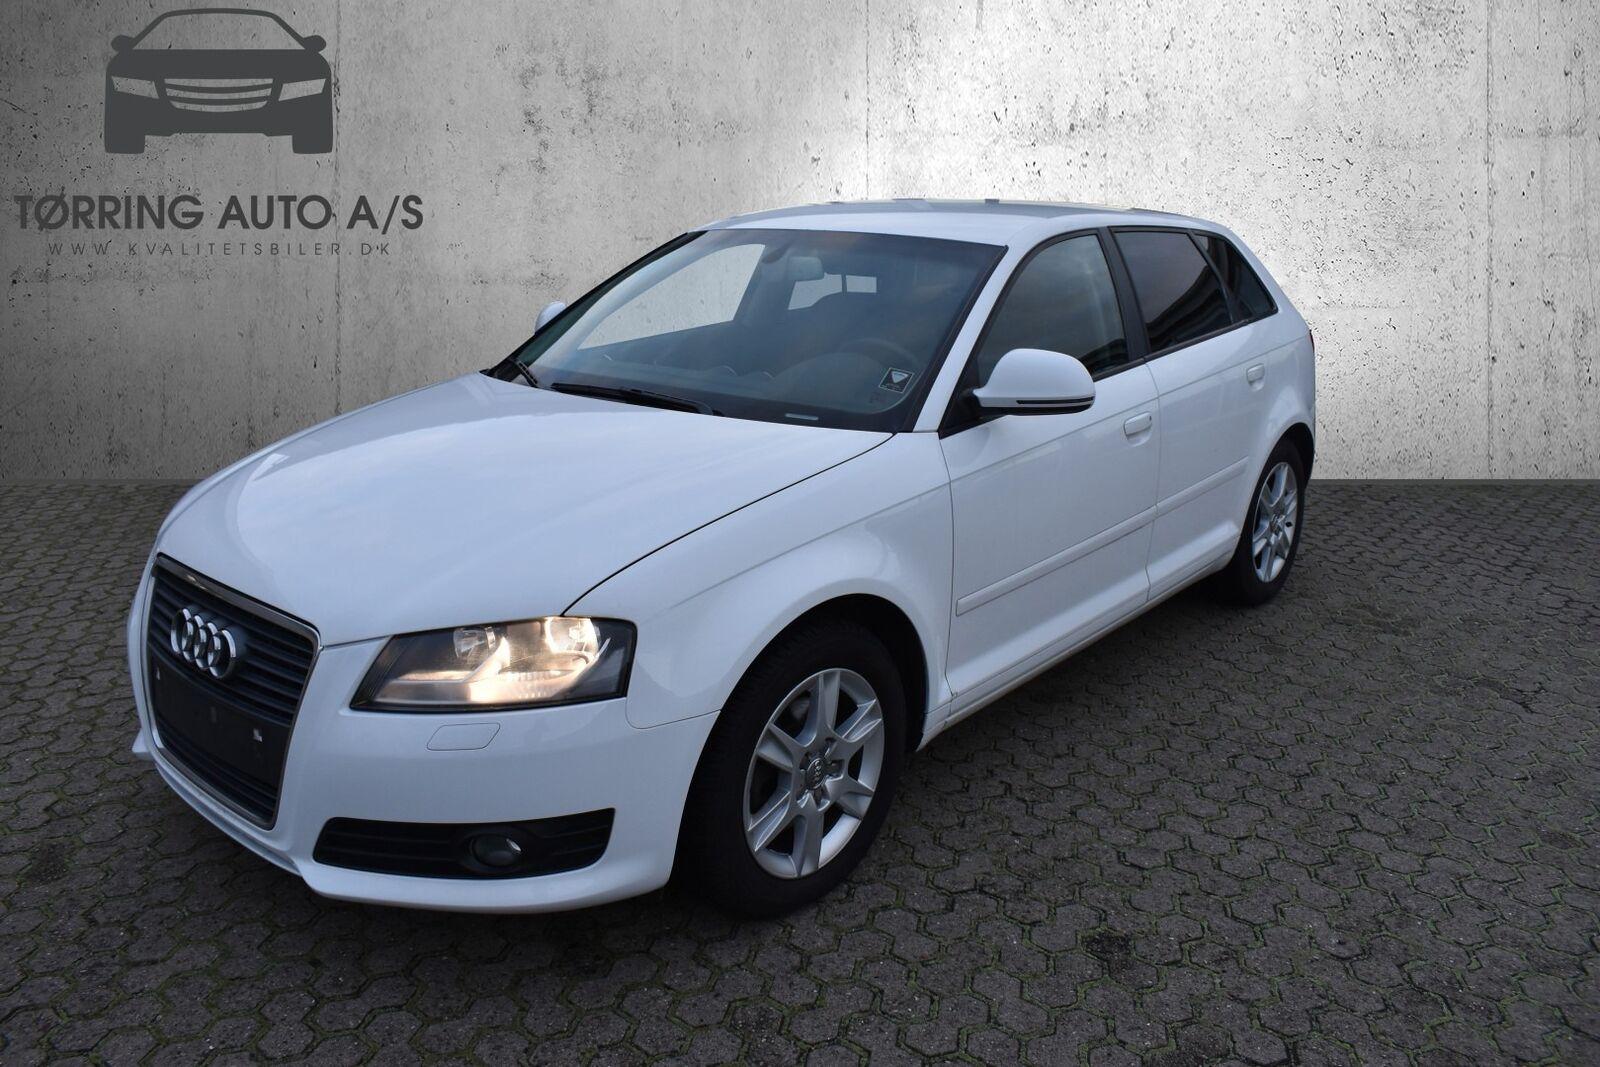 Audi A3 2,0 TDi 140 Attraction SB 5d